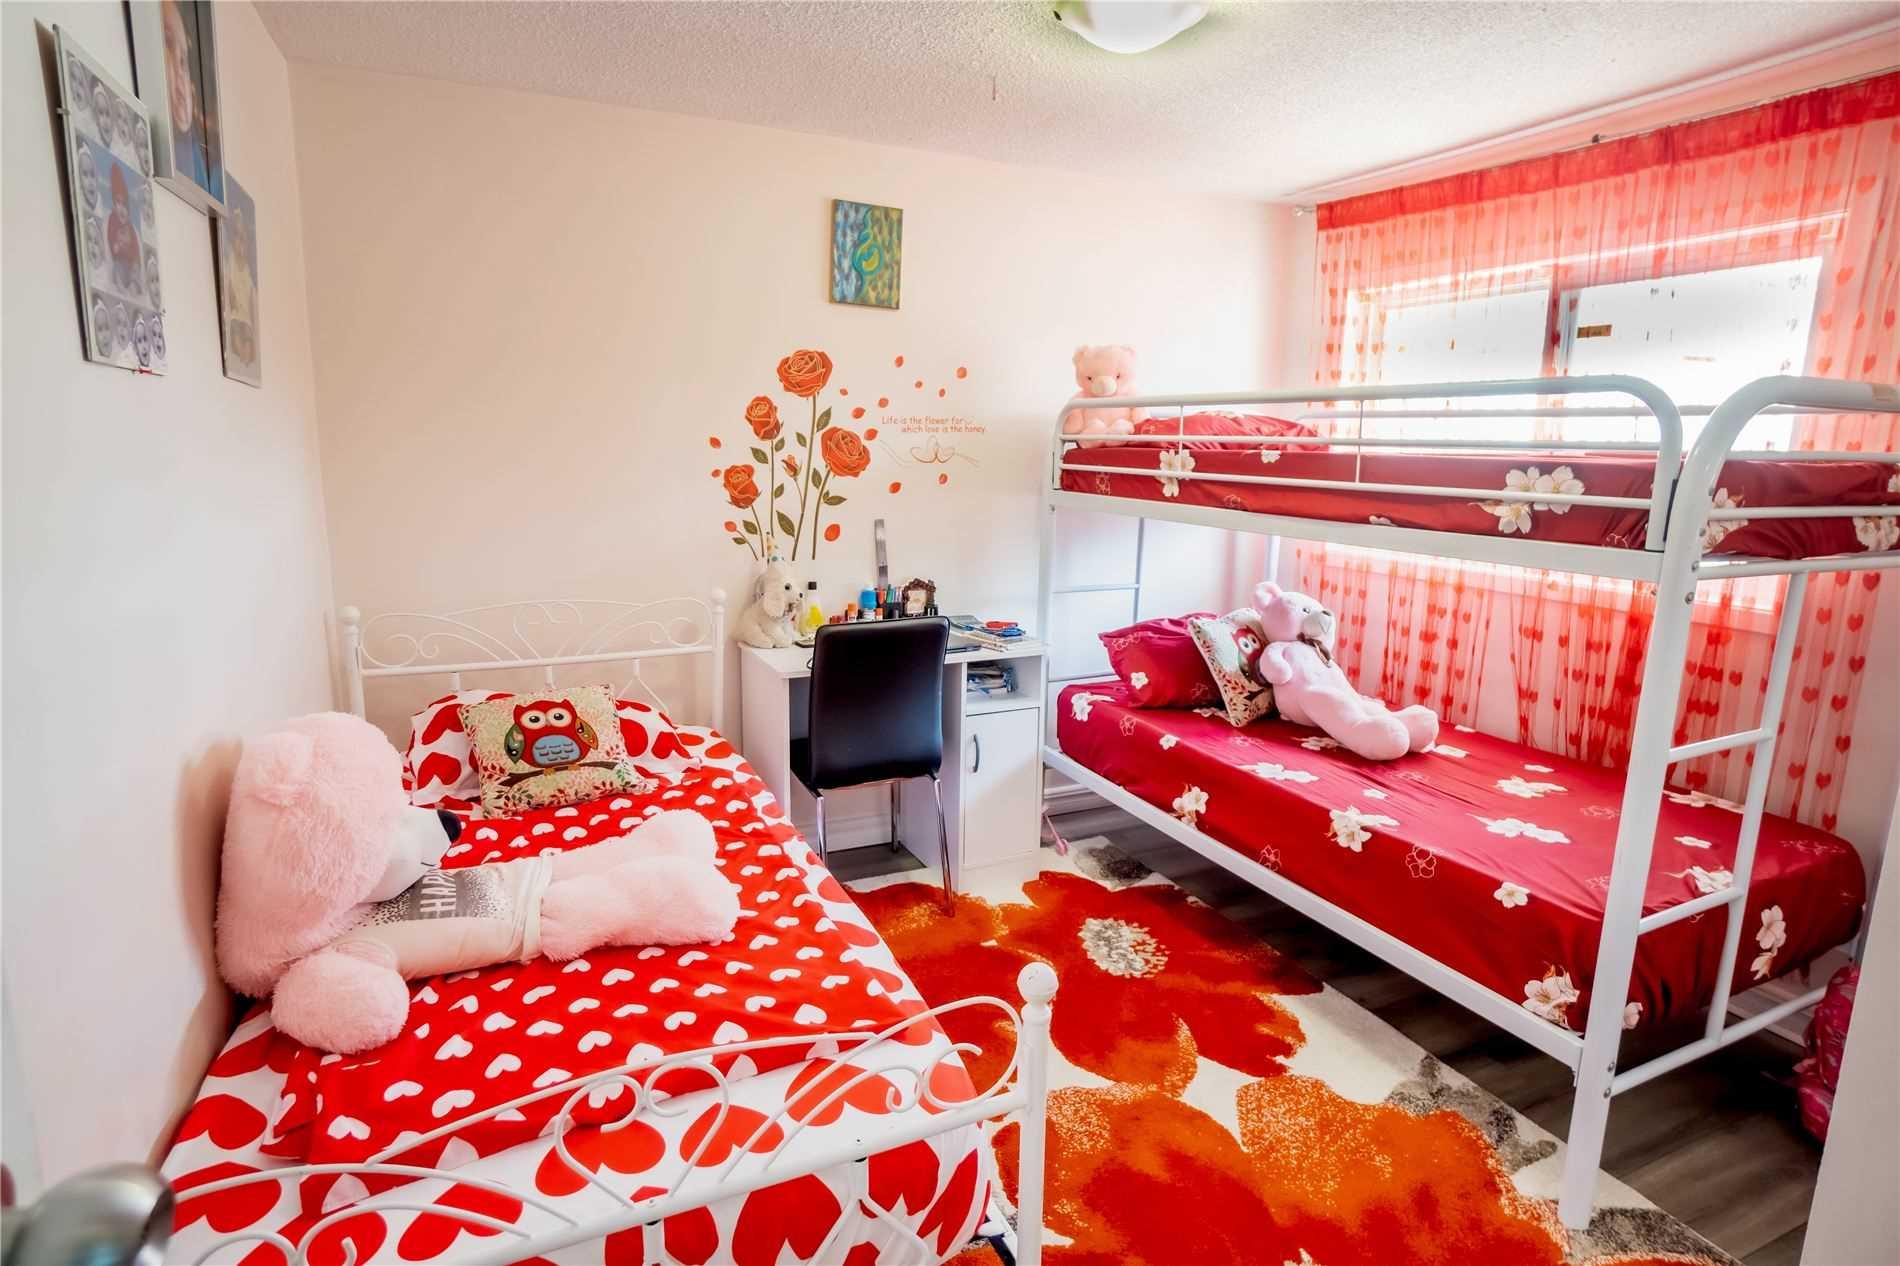 1554 Geta Circle W Circ, Pickering, Ontario L1V 3H7, 3 Bedrooms Bedrooms, 6 Rooms Rooms,3 BathroomsBathrooms,Att/Row/Twnhouse,For Sale,Geta Circle W,E5354105